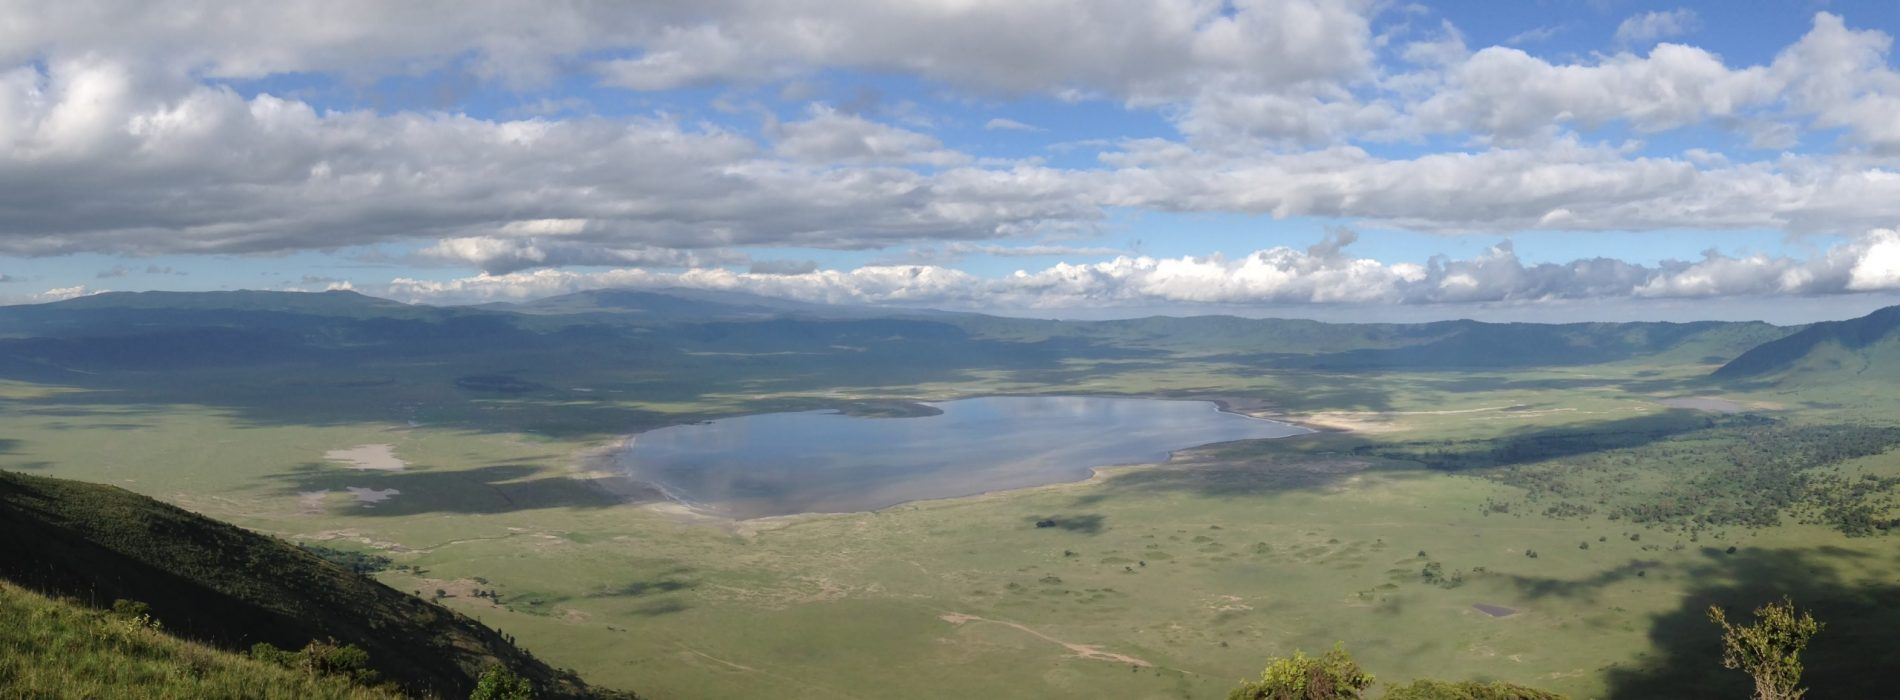 Tanzania_Ngorongoro Crater_The View